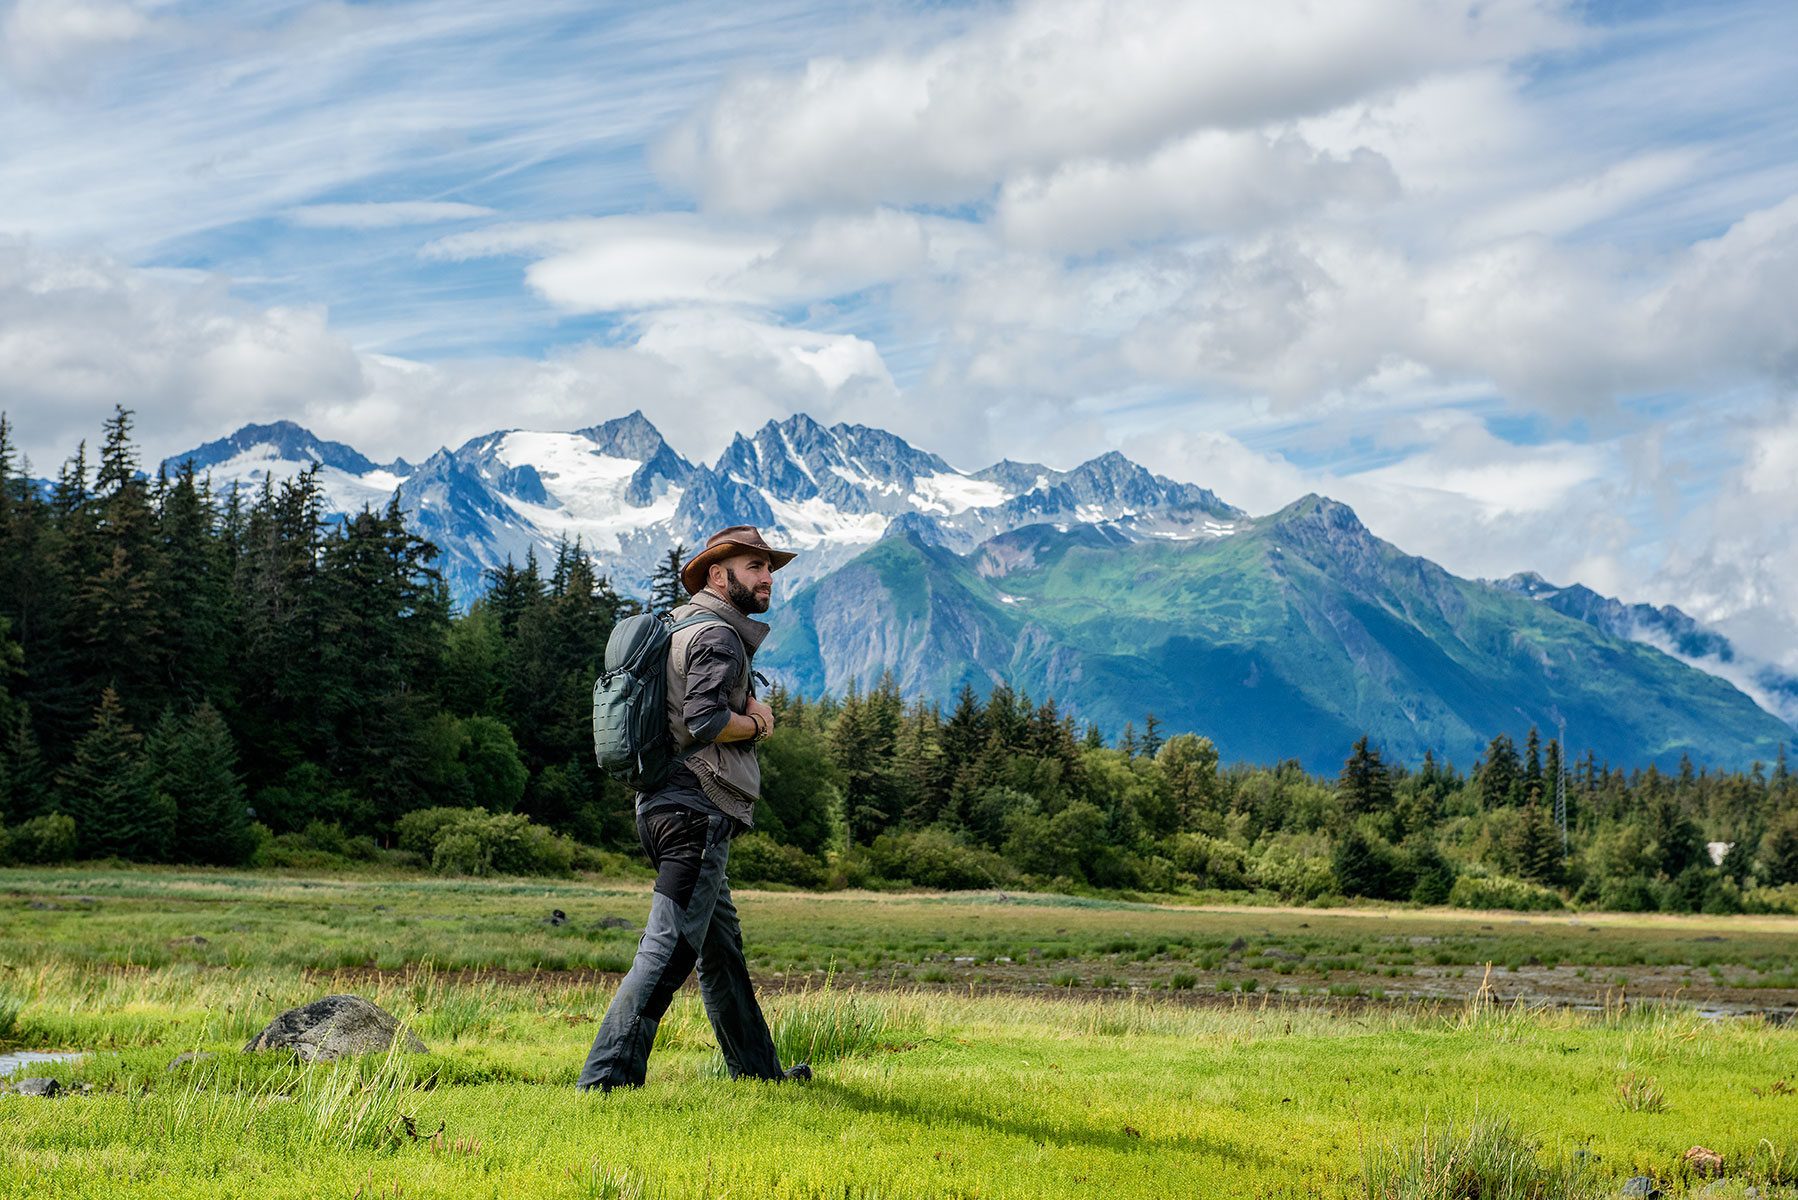 austin-trigg-brave-wilderness-alaska-BW-Coyote-Walks-Mud-Bay-looking-mountains.jpg